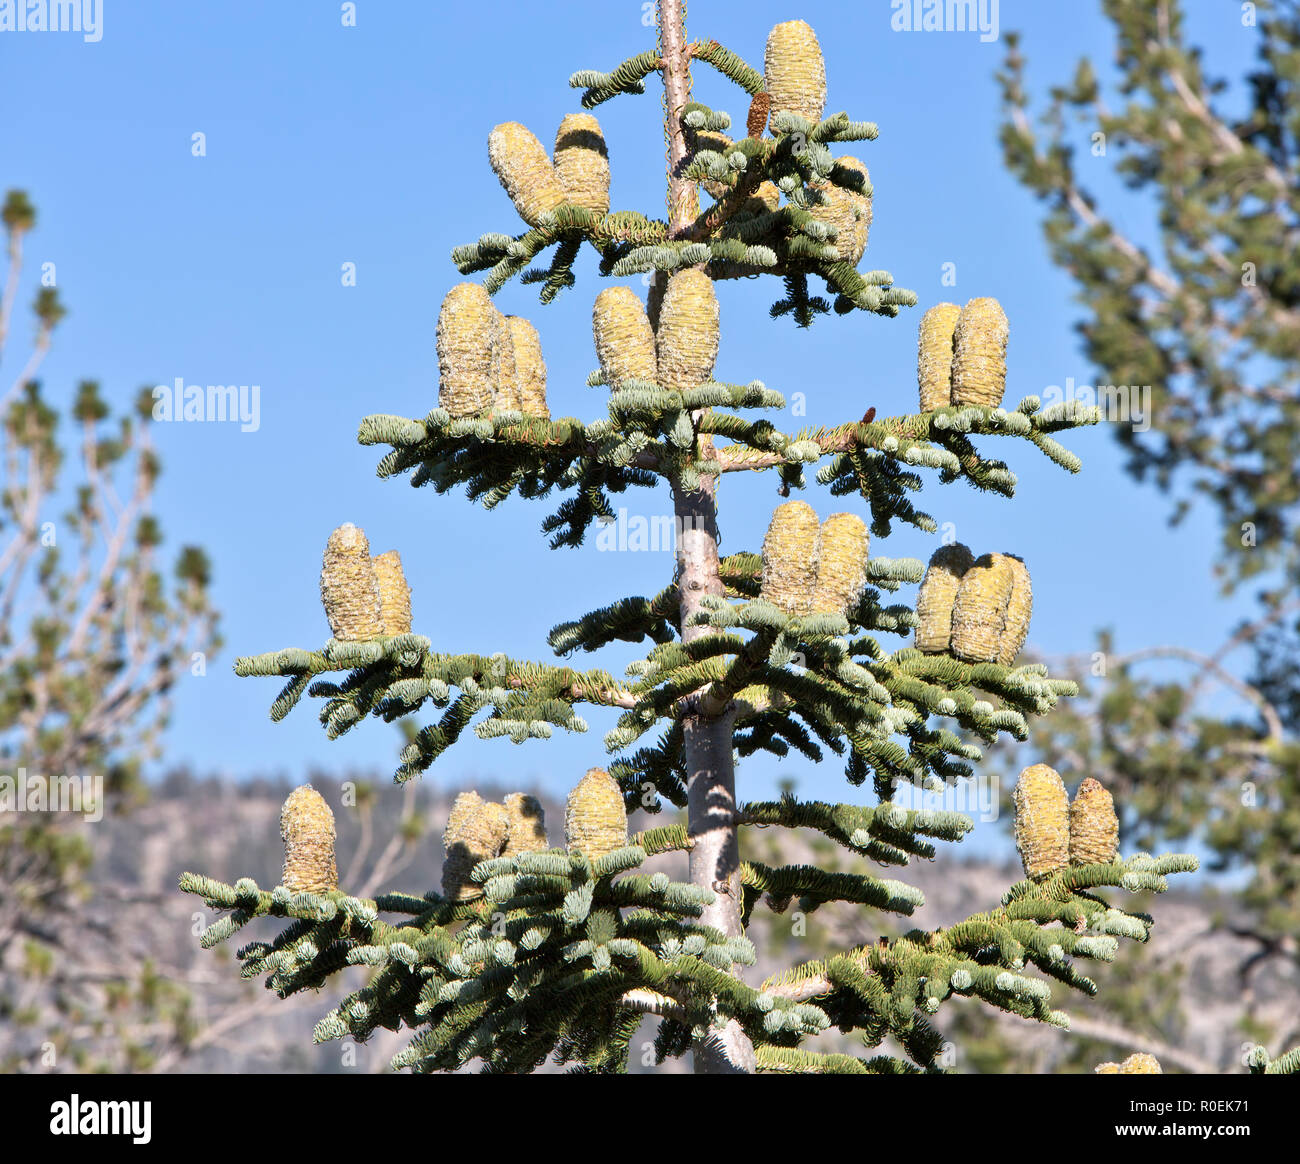 Red Fir, maturing cones  'Abies magnifica' tree, maturing cones. - Stock Image